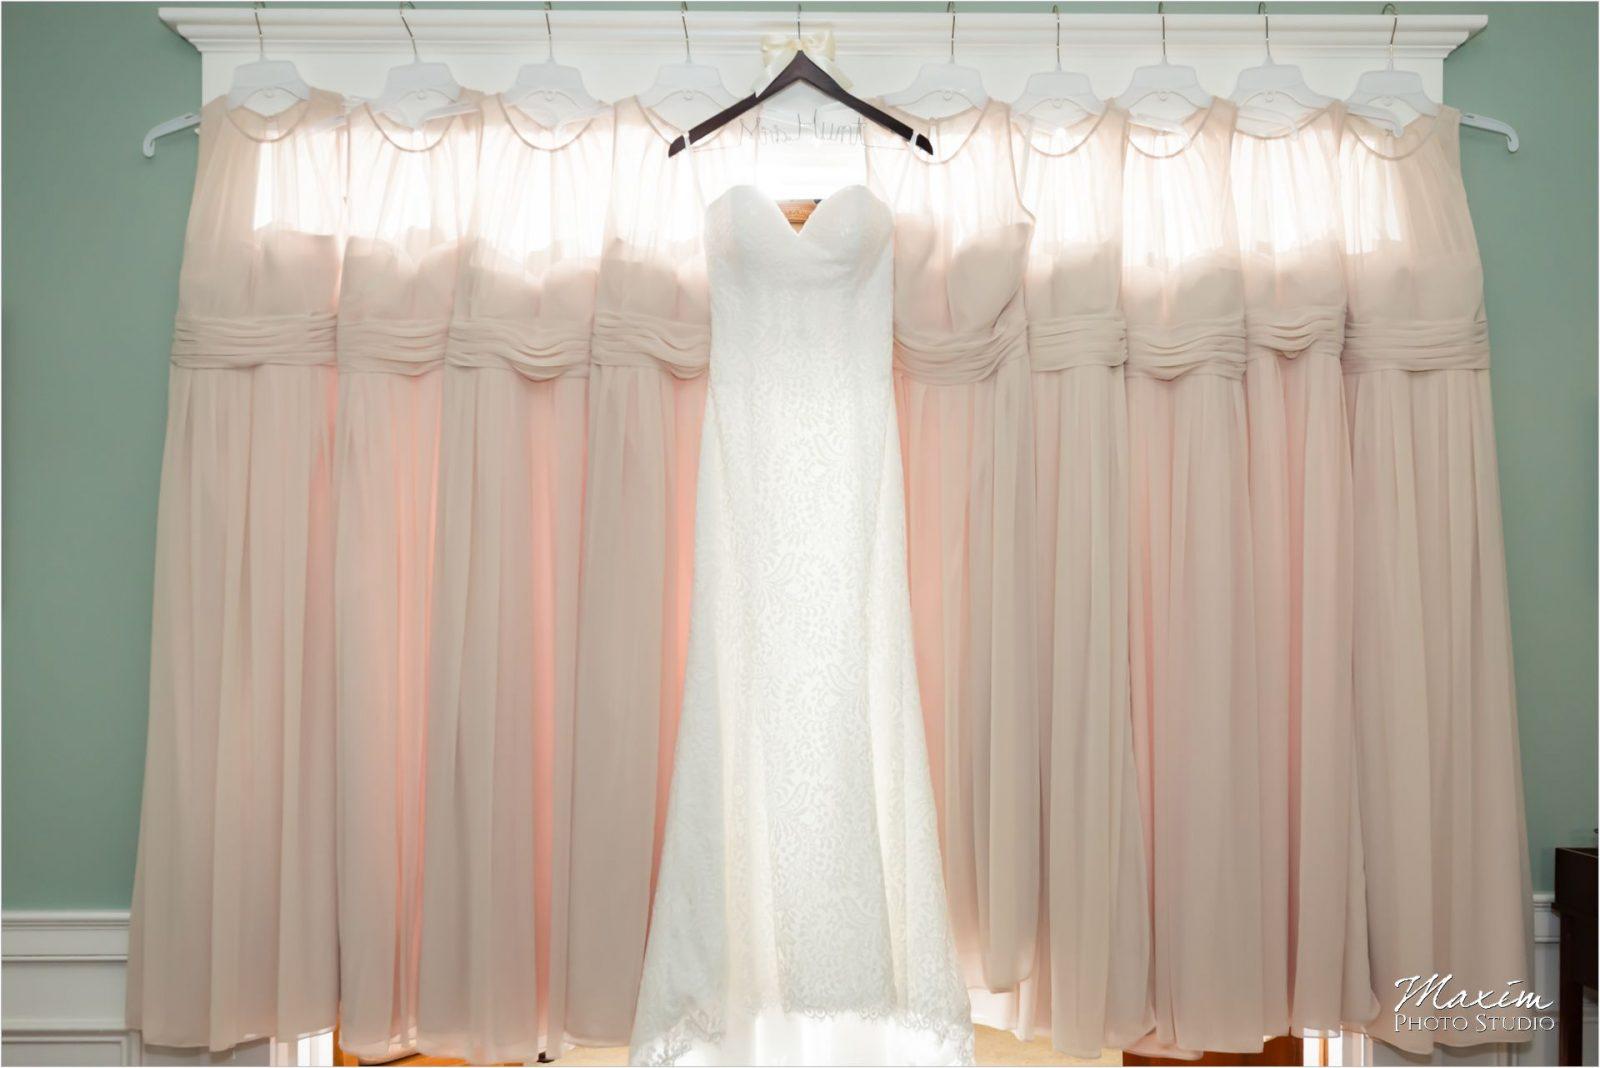 Drees Pavilion Wedding Photography | Elise + Bill Weddings